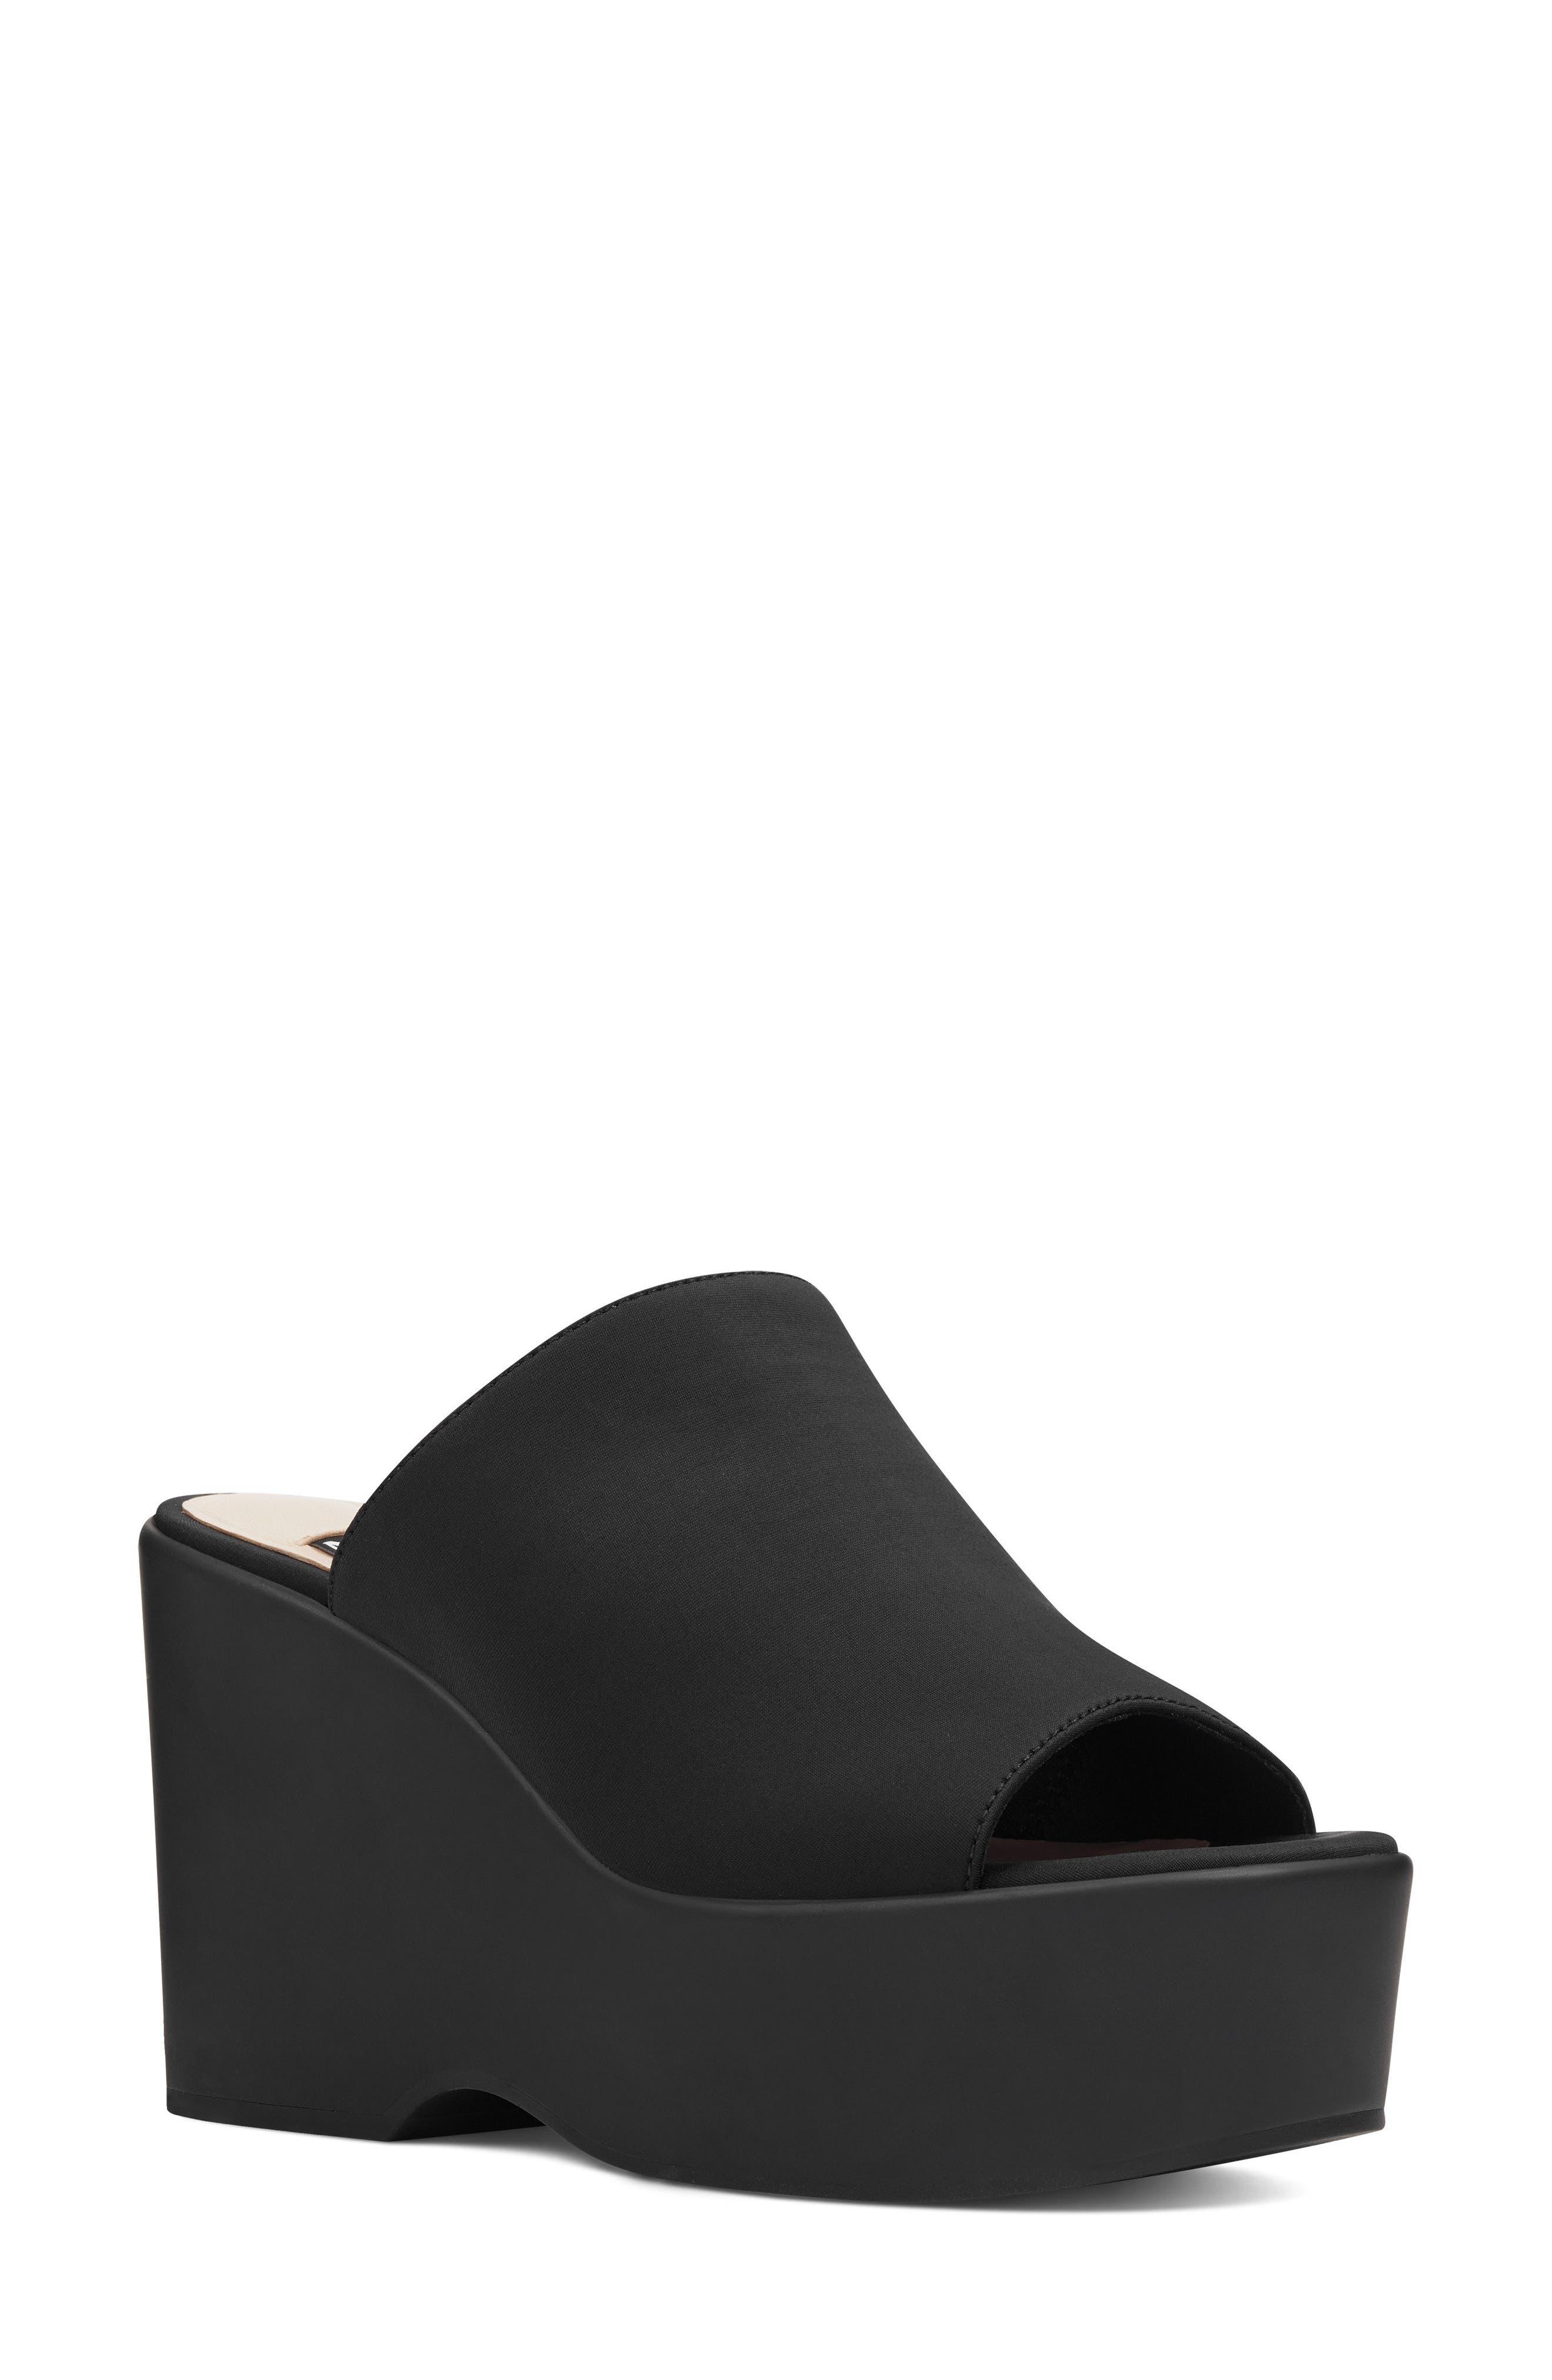 Tomo - 40th Anniversary Capsule Collection Platform Sandal,                         Main,                         color, BLACK FABRIC